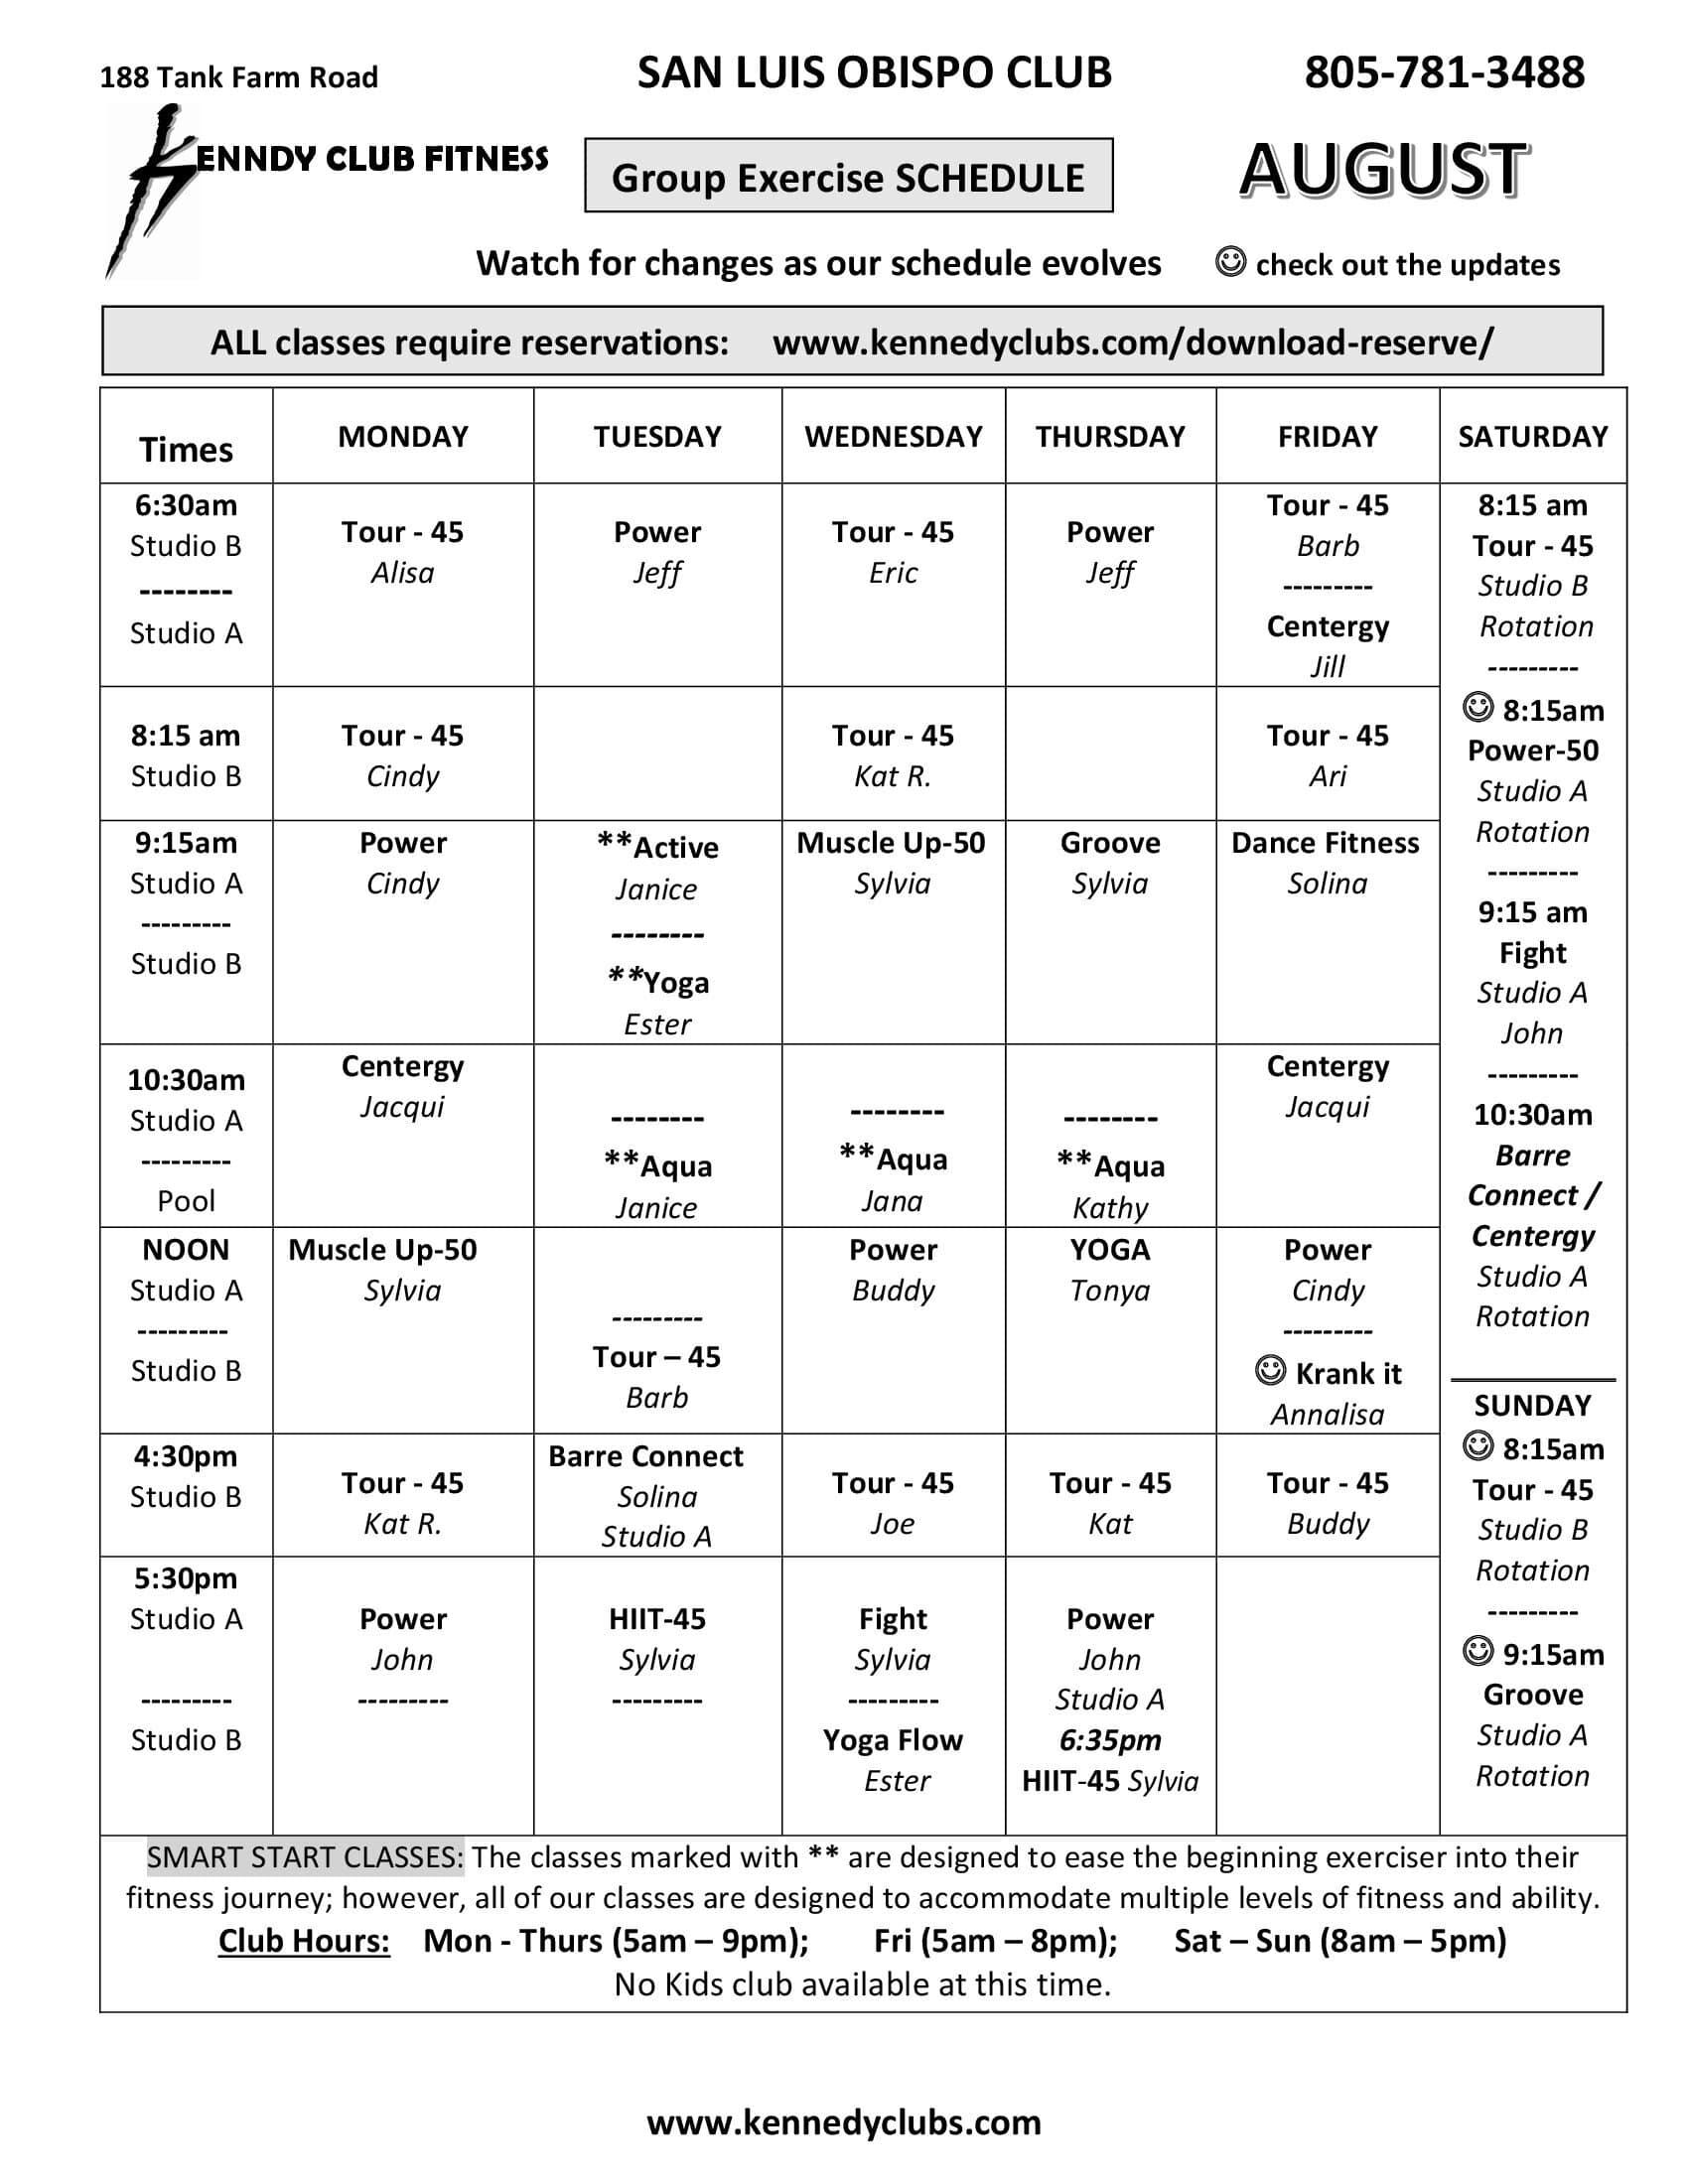 Kennedy Club Fitness San Luis Obispo Group Exercise Schedule 08 01 2021